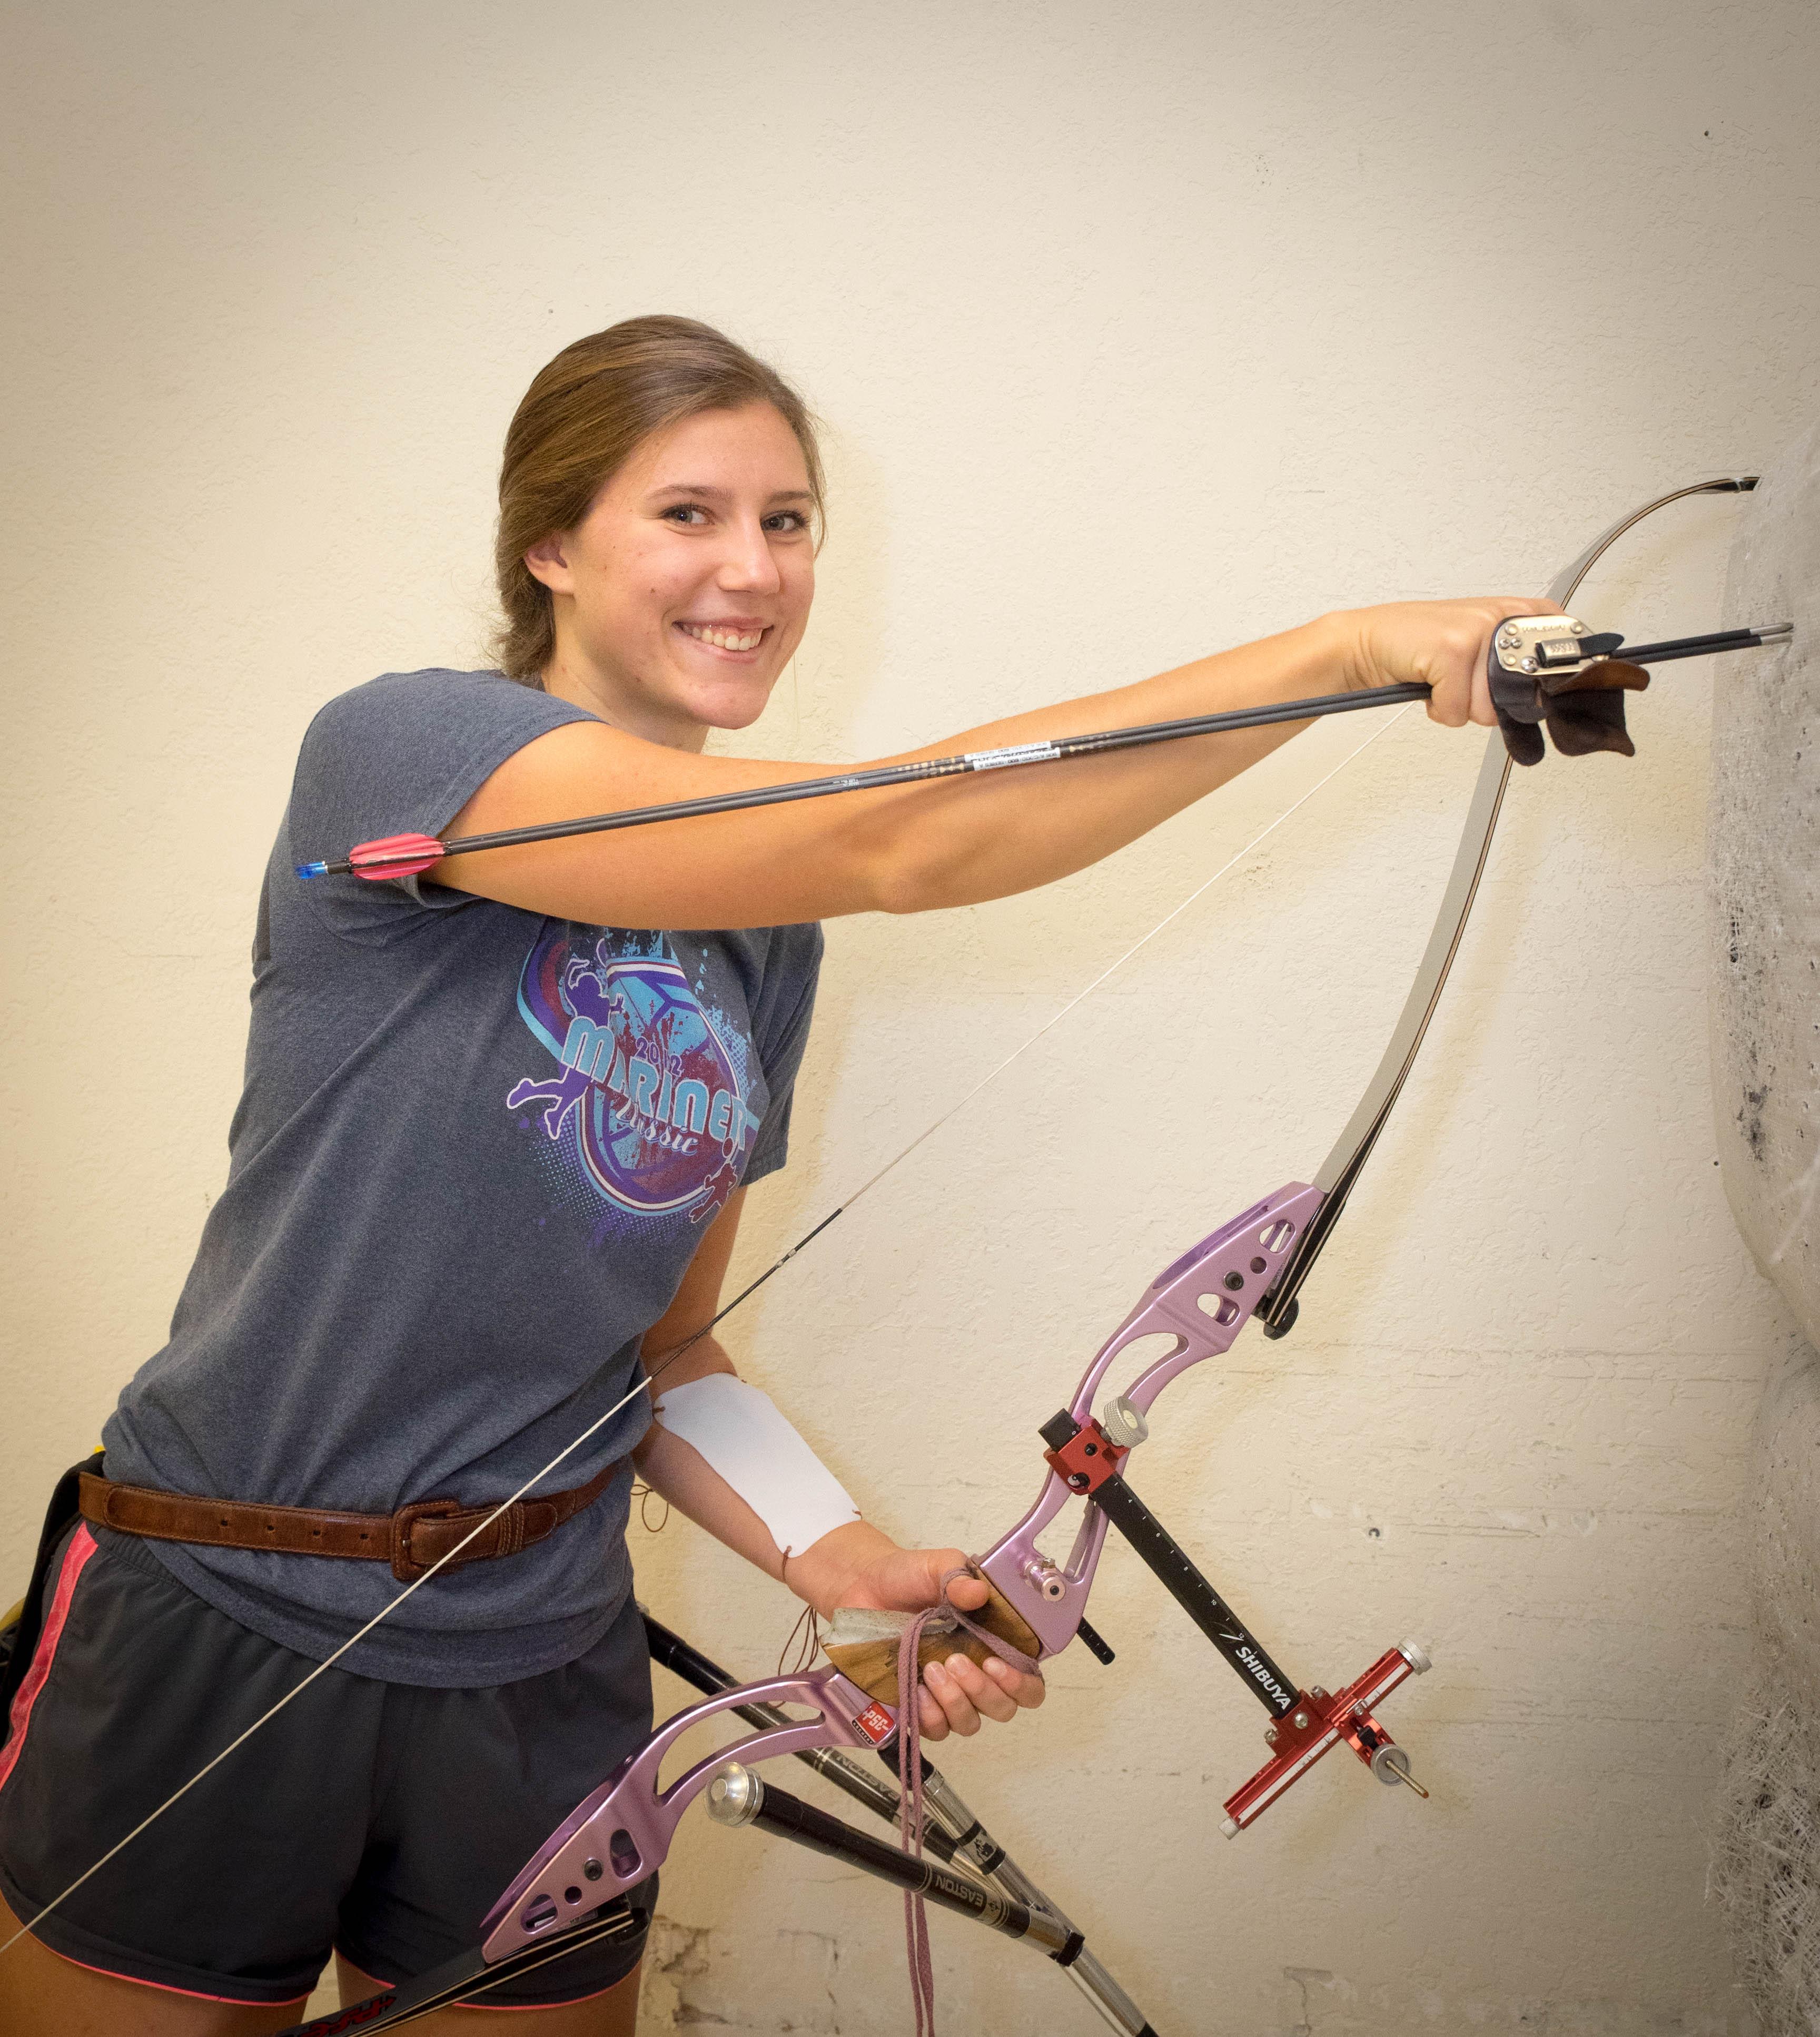 Balboa Park Archery Range